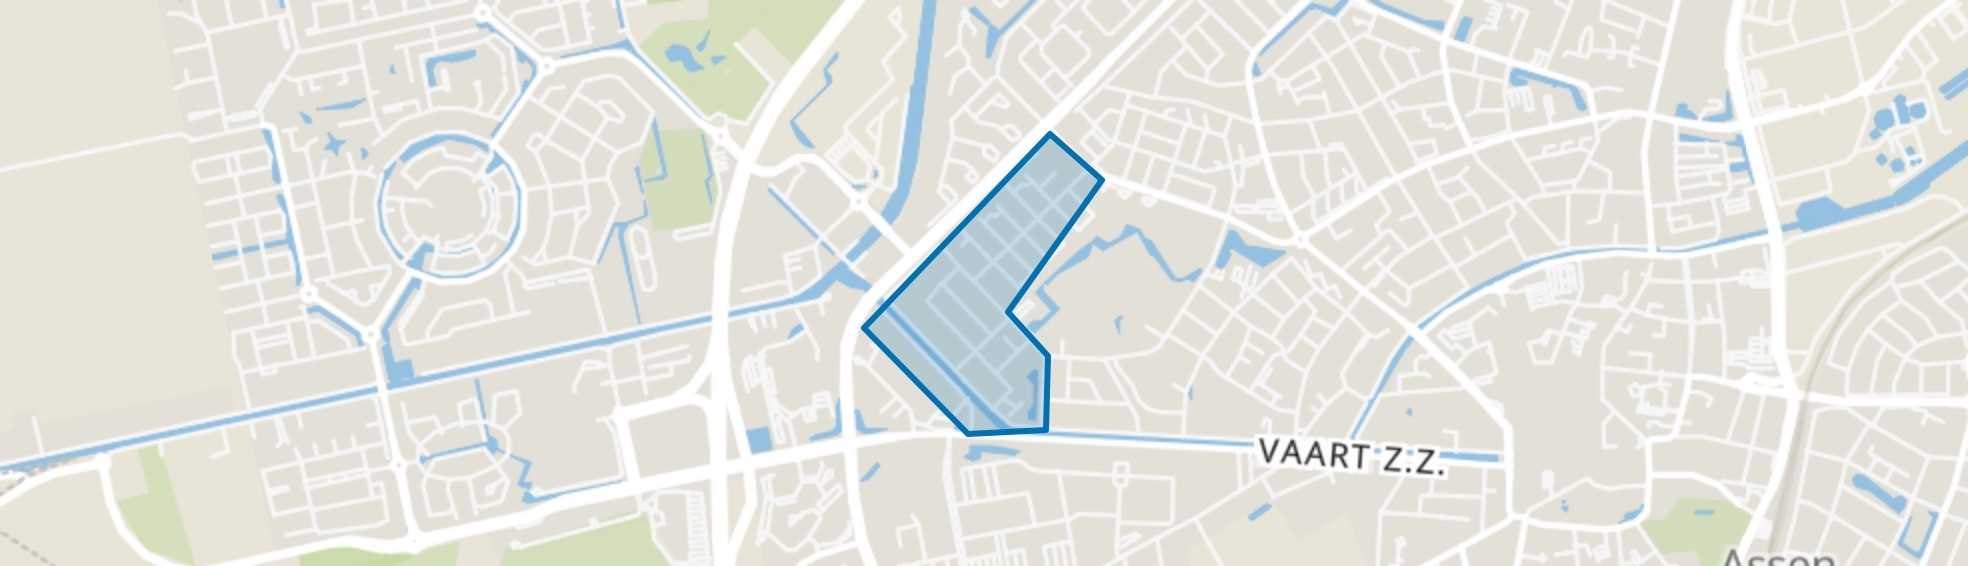 De Lariks West, Assen map